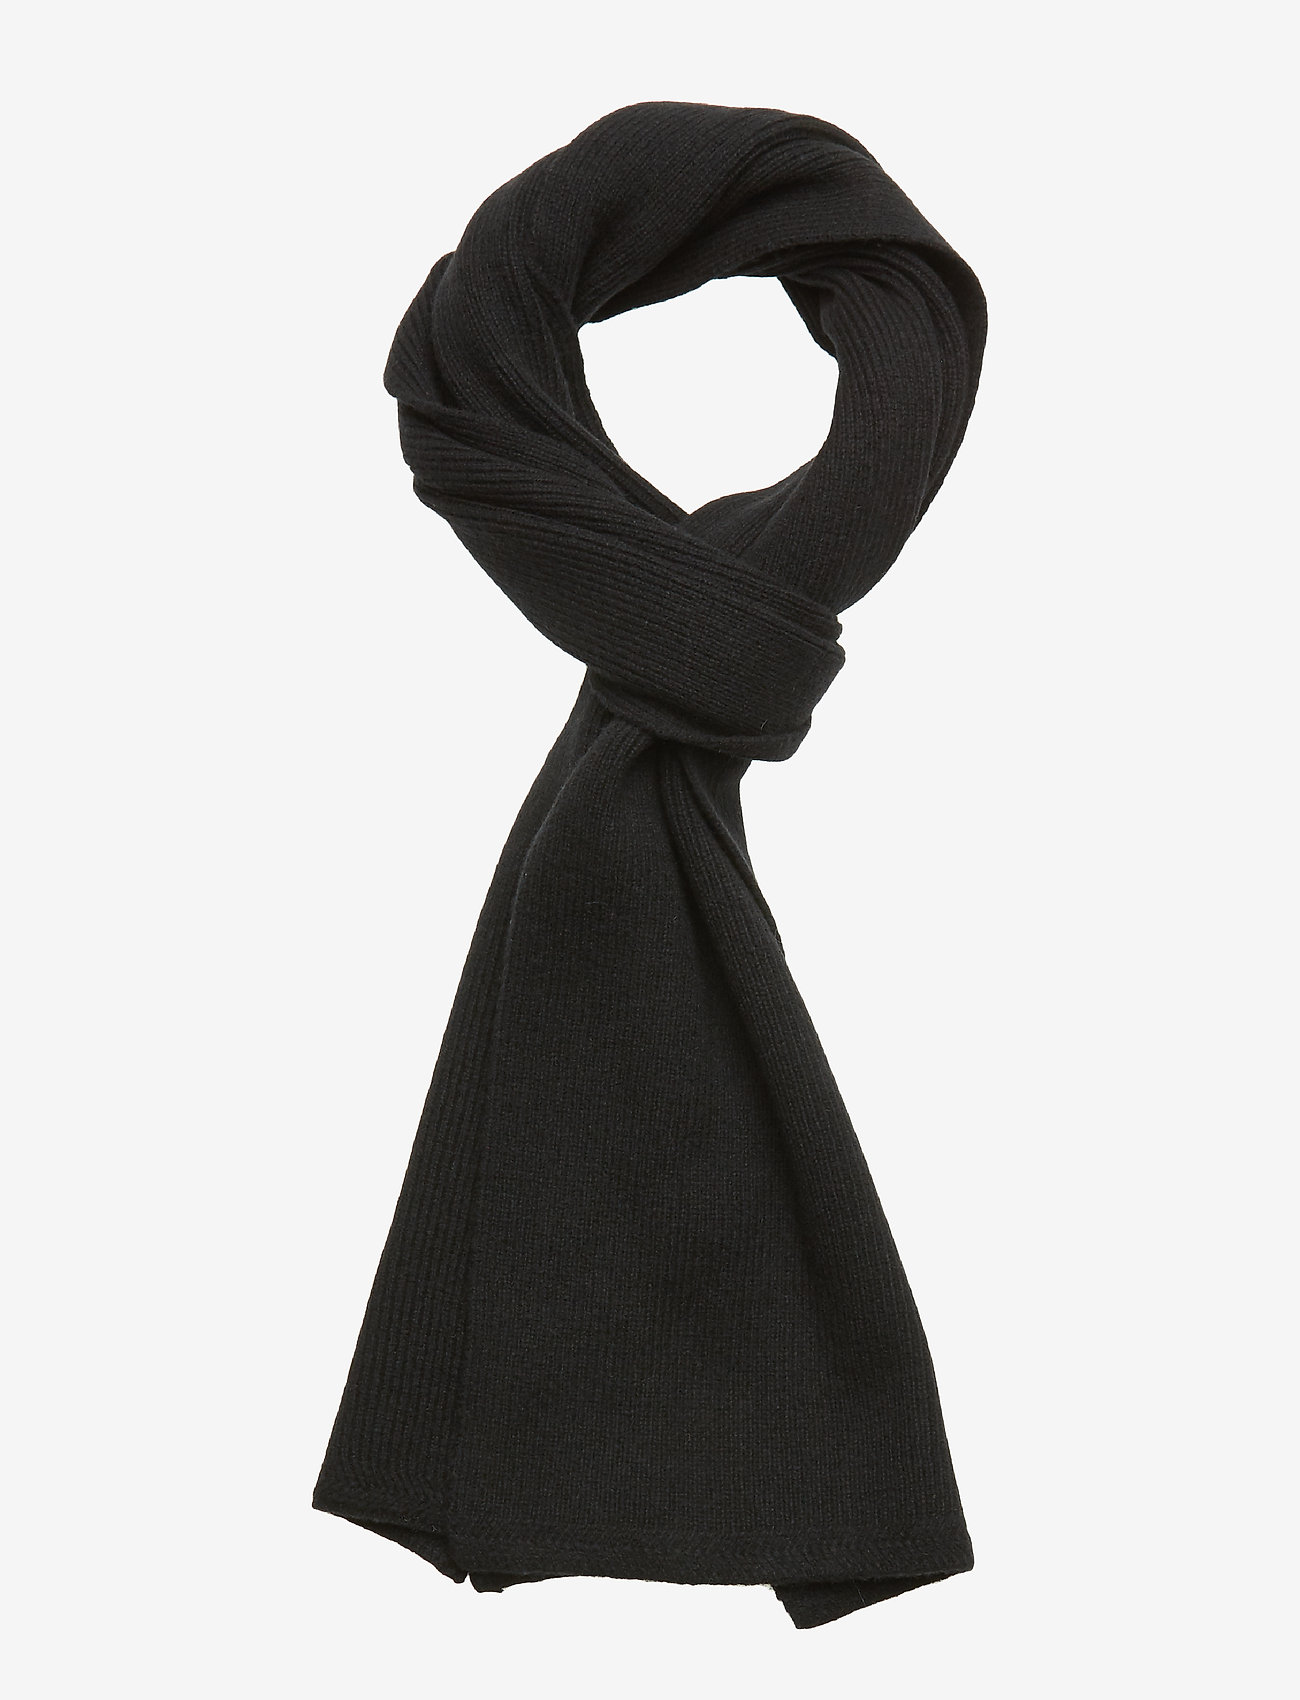 Lyle & Scott - Racked rib scarf - true black - 0